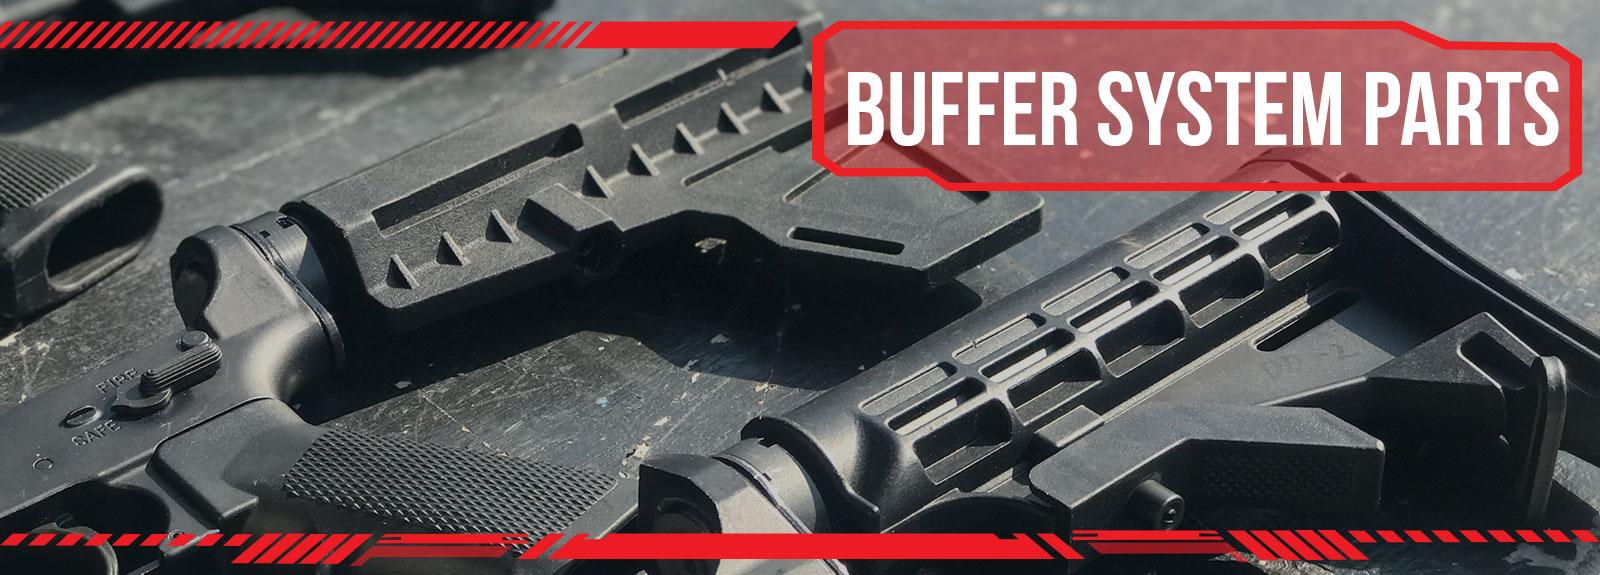 Ar-15 & Lr-308 Rifle Stocks & Pistol Braces, Buffer Tube